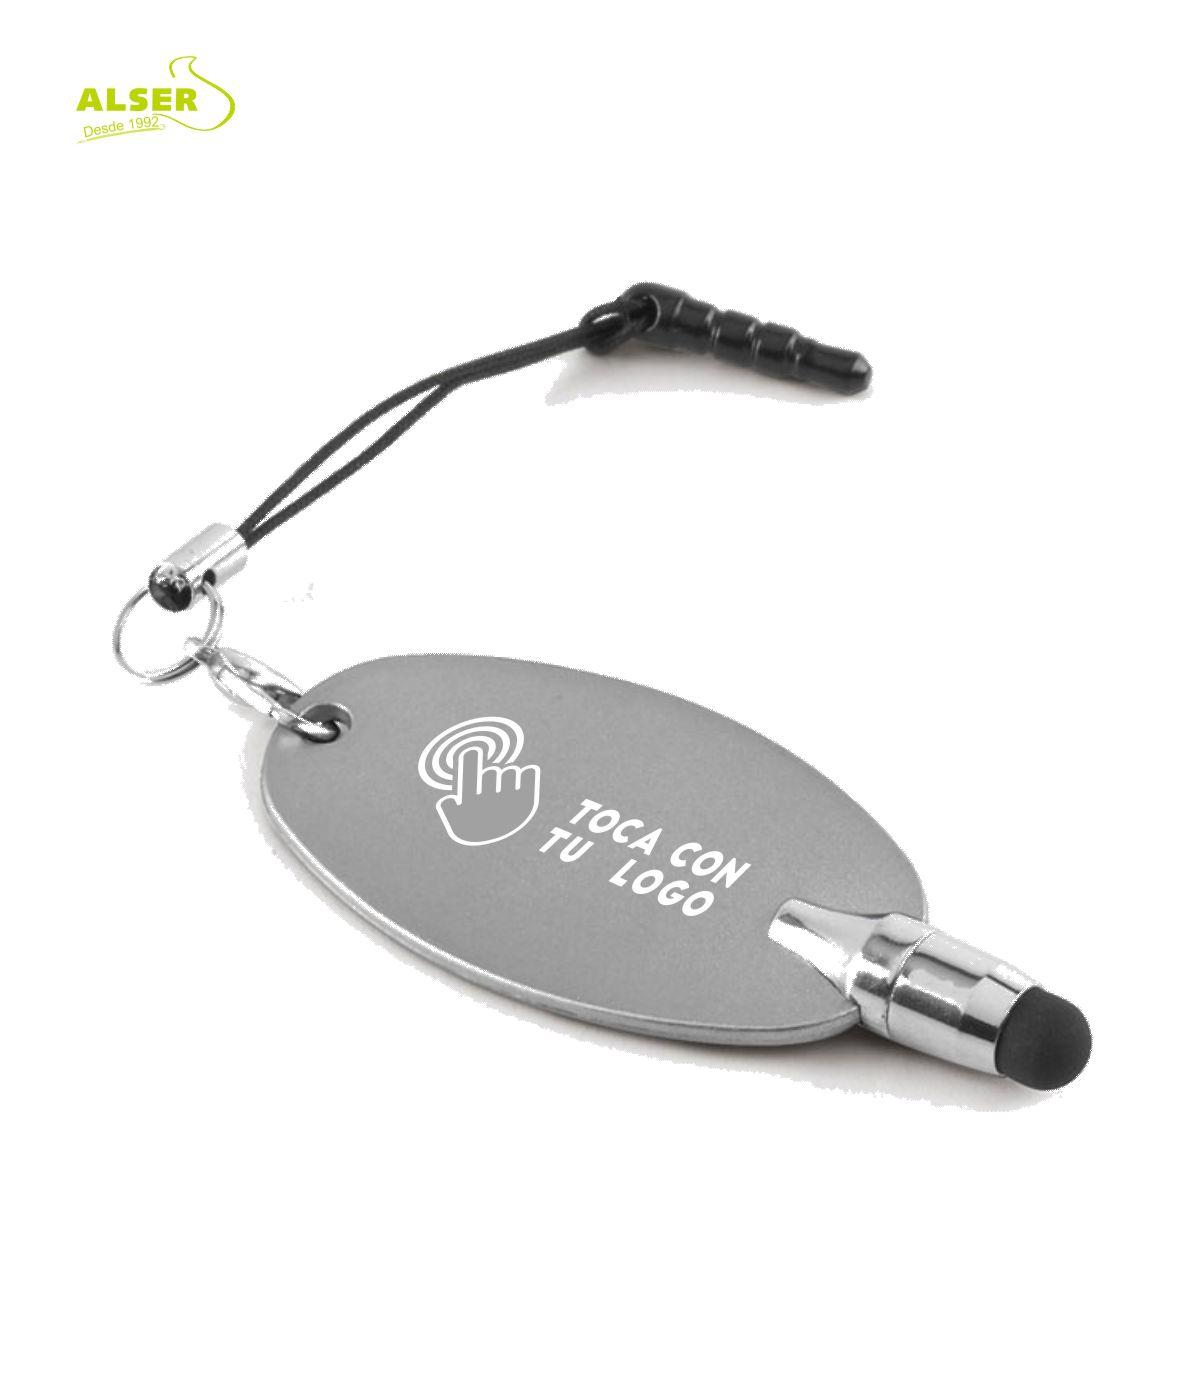 Puntero touch movil personalizado para empresas. Plata